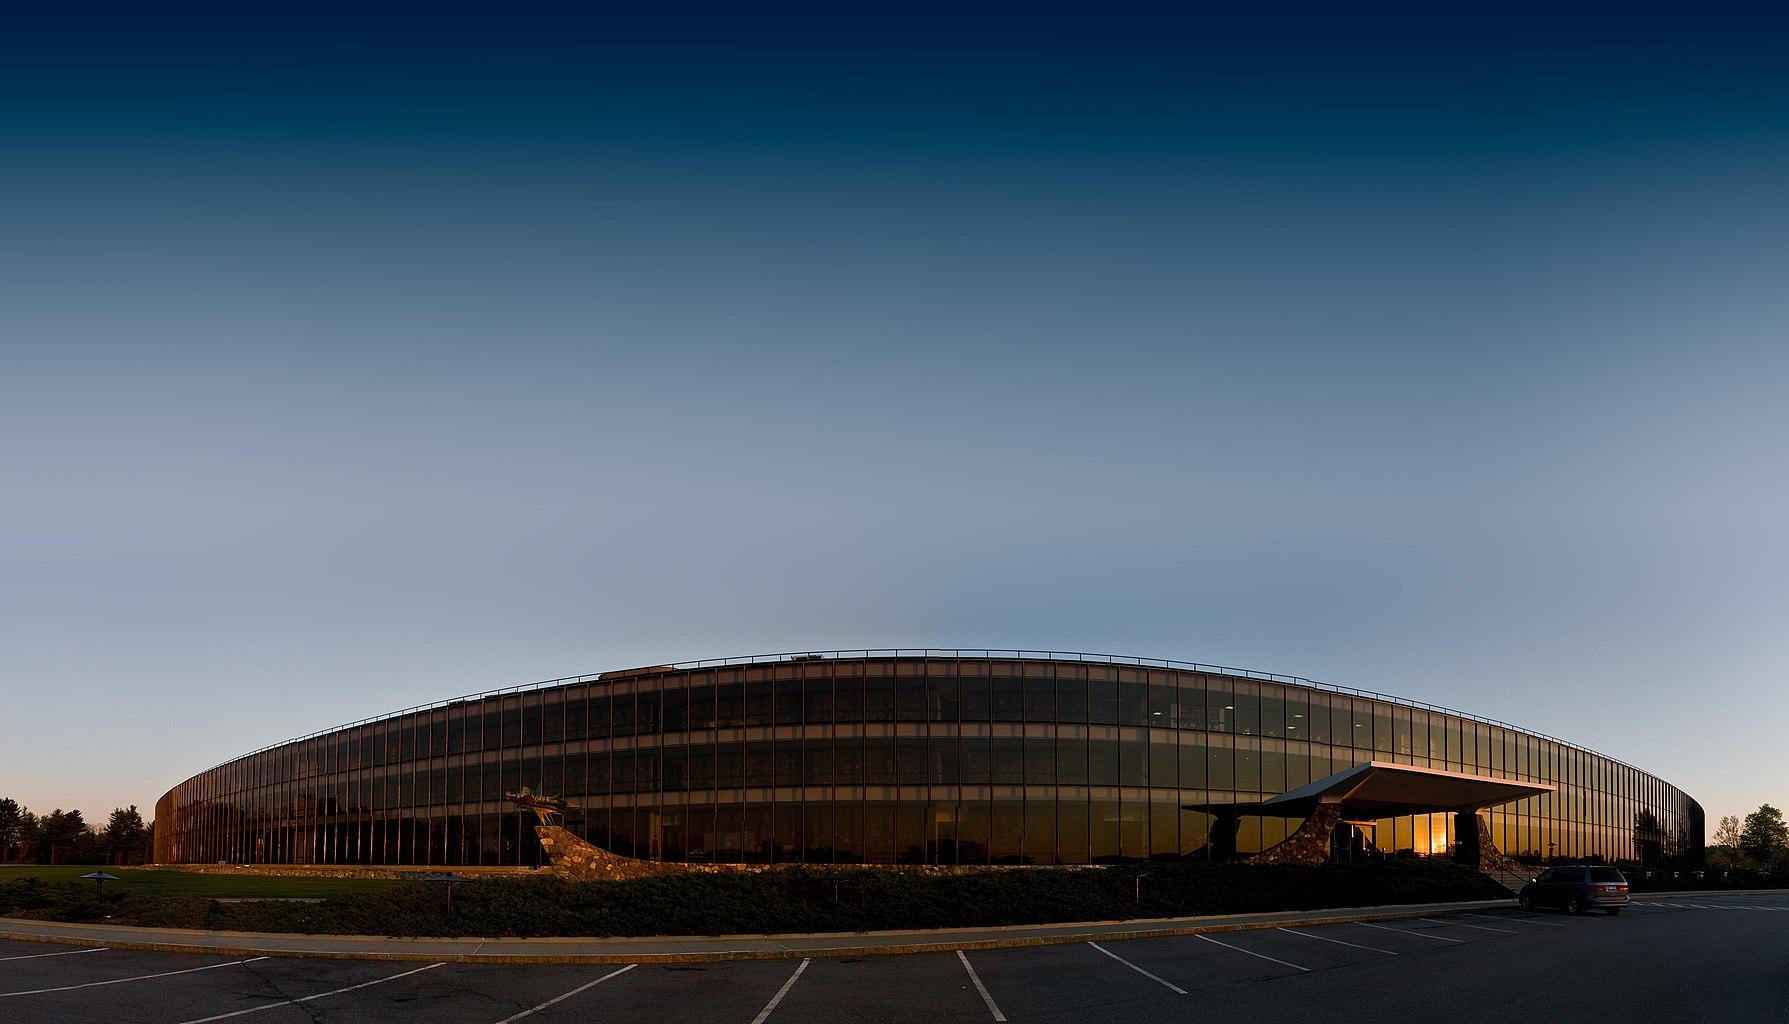 IBM Research headquarters, the Eero Saarinen-designed Thomas J. Watson Research Center in Yorktown Heights, New York.